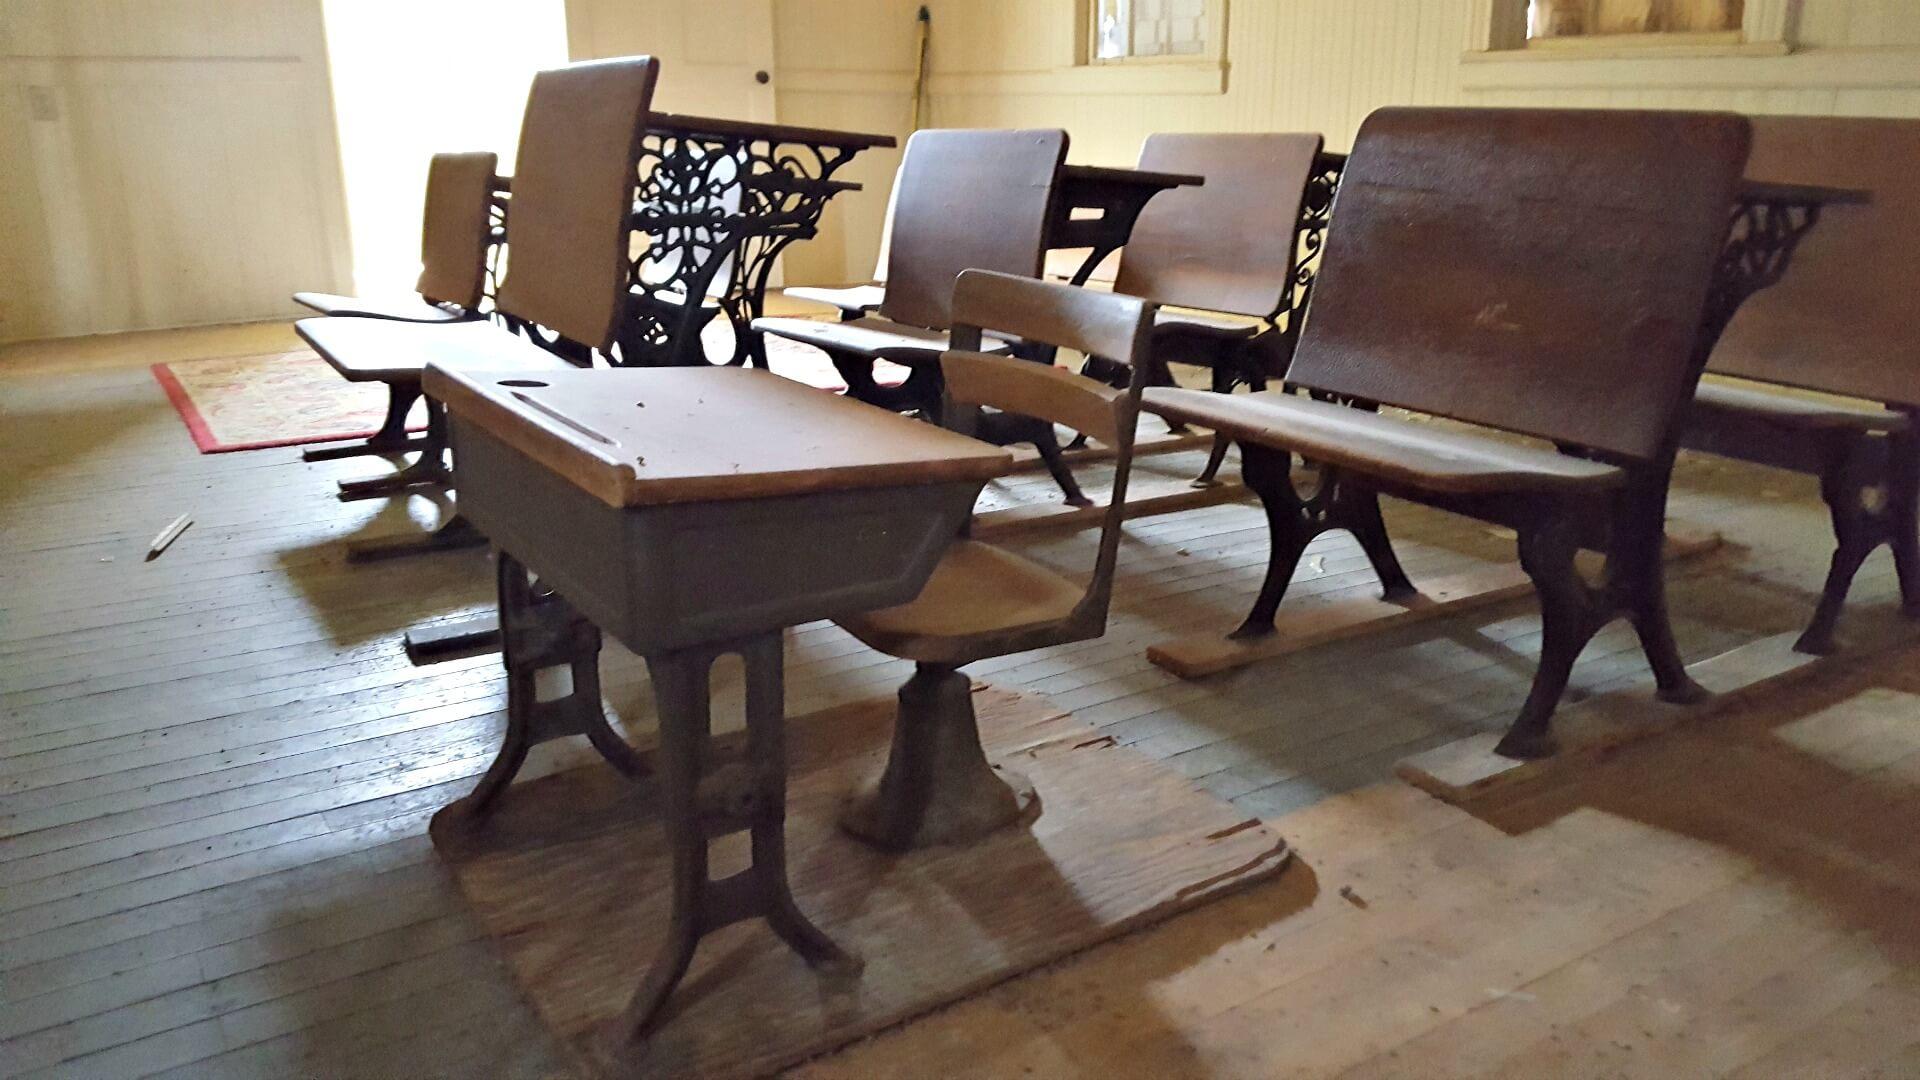 Desks inside the former Belding School